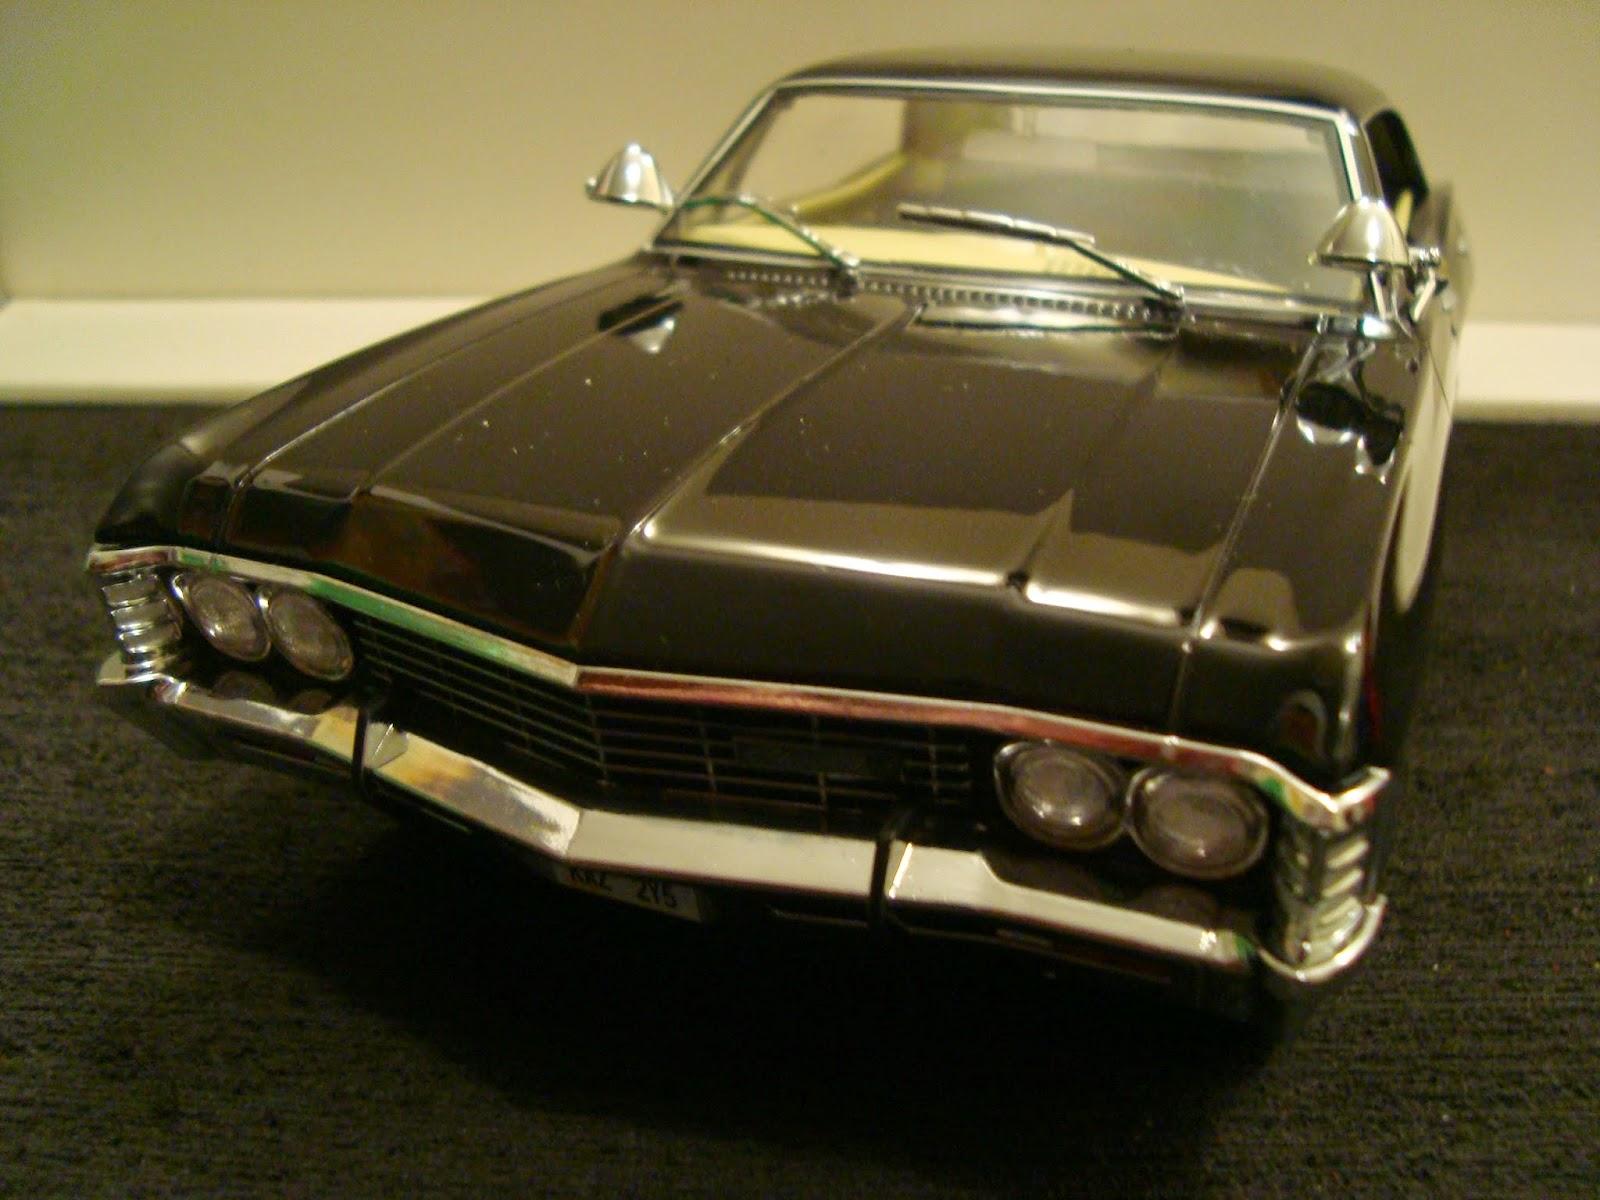 1967 chevrolet impala ss [ 1600 x 1200 Pixel ]